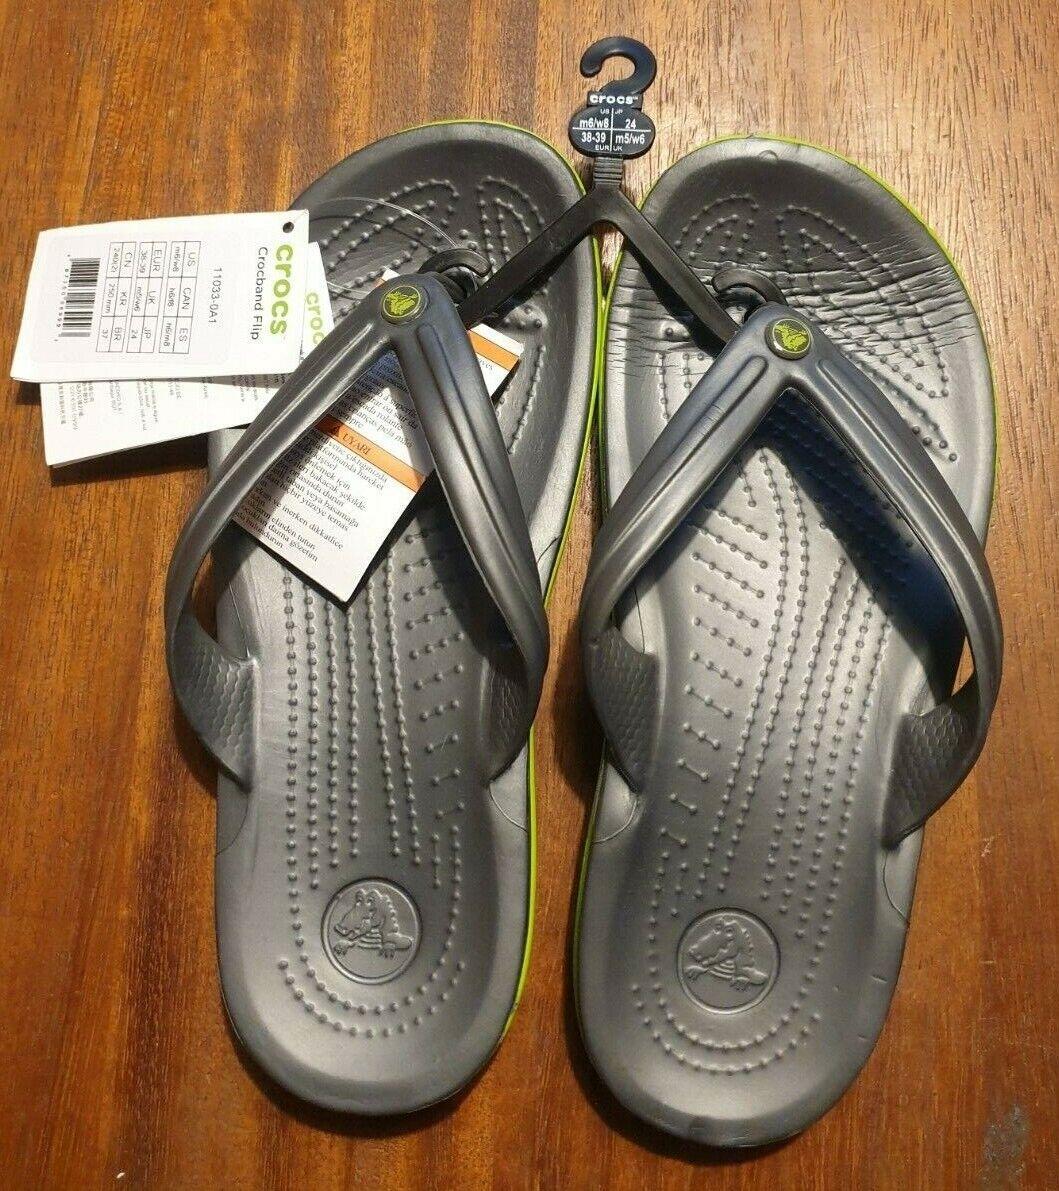 Crocs Unisex's Crocband Adults Grey/Green Flip Flops UK M5/W6 FREE POST